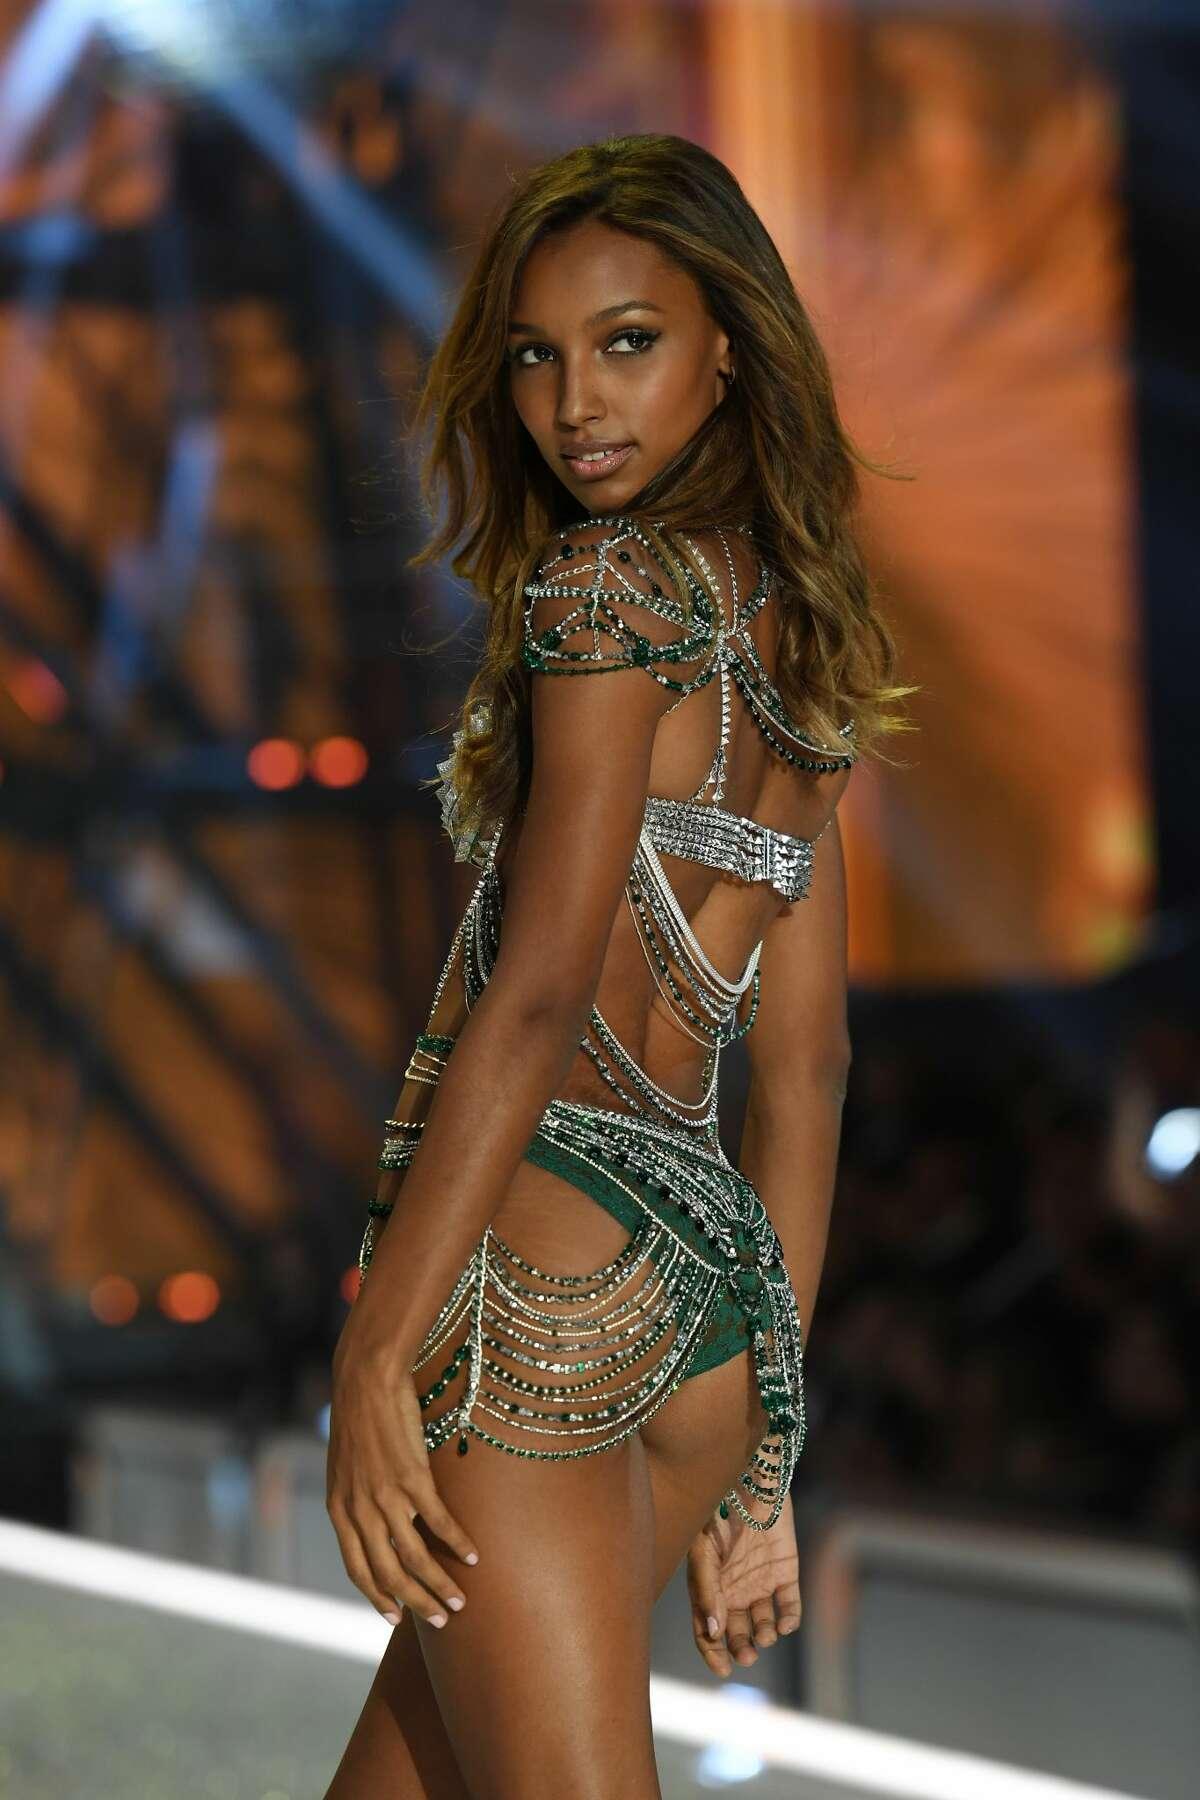 Jasmine Tookes wearing the three million dollar Fantasy Bra during the 2016 Victoria's Secret Fashion Show.